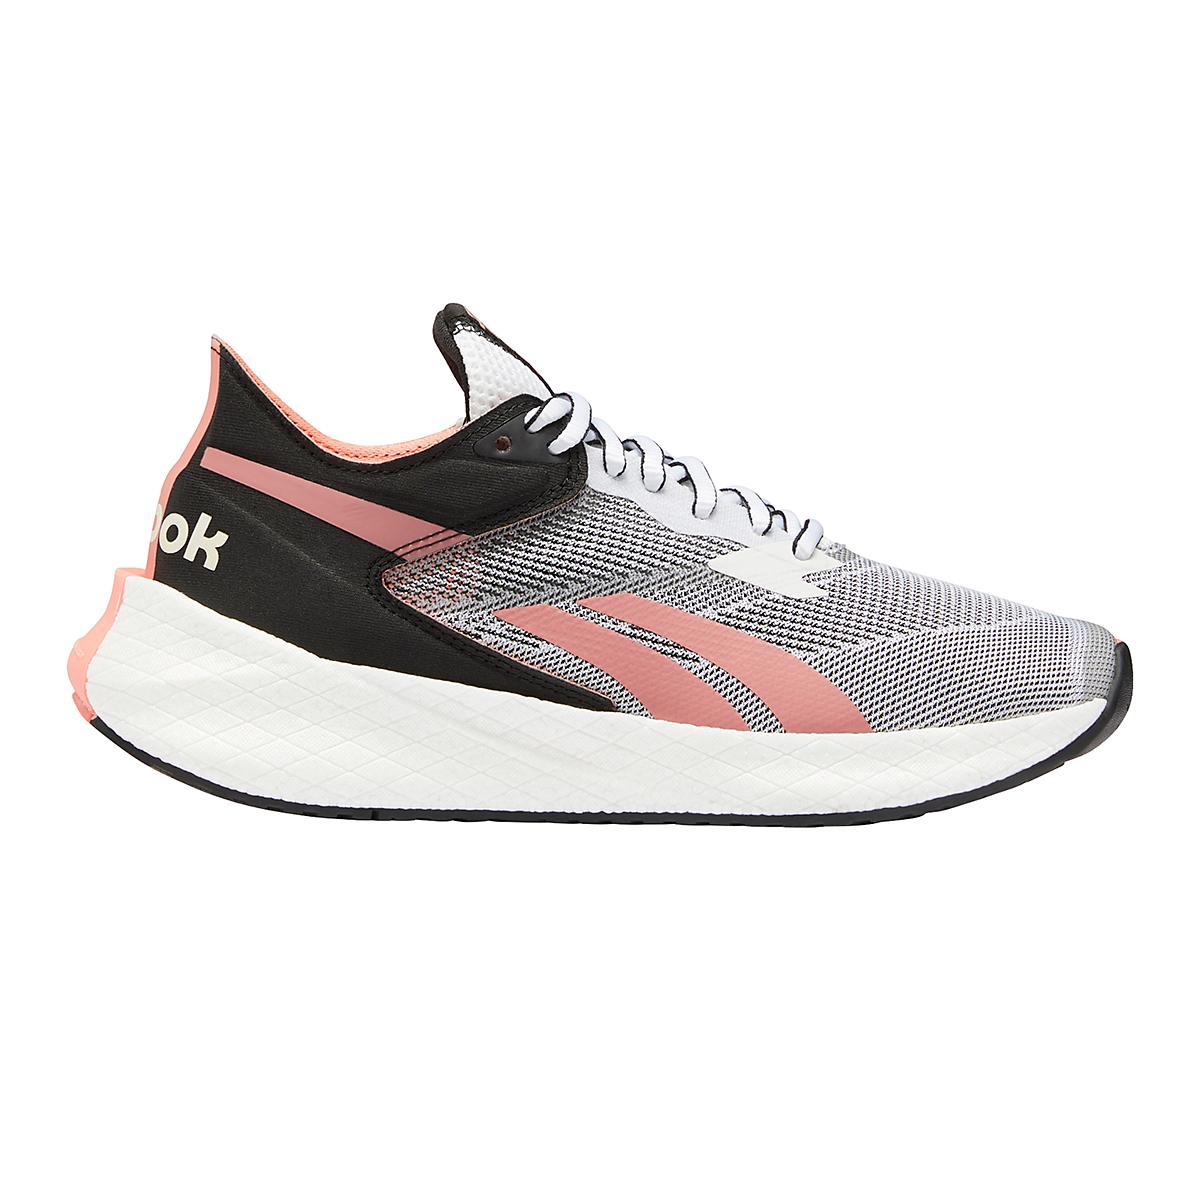 Women's Reebok Floatride Energy Symmetros Running Shoe - Color: White/Core Black/Twisted Coral - Size: 6.5 - Width: Regular, White/Core Black/Twisted Coral, large, image 1